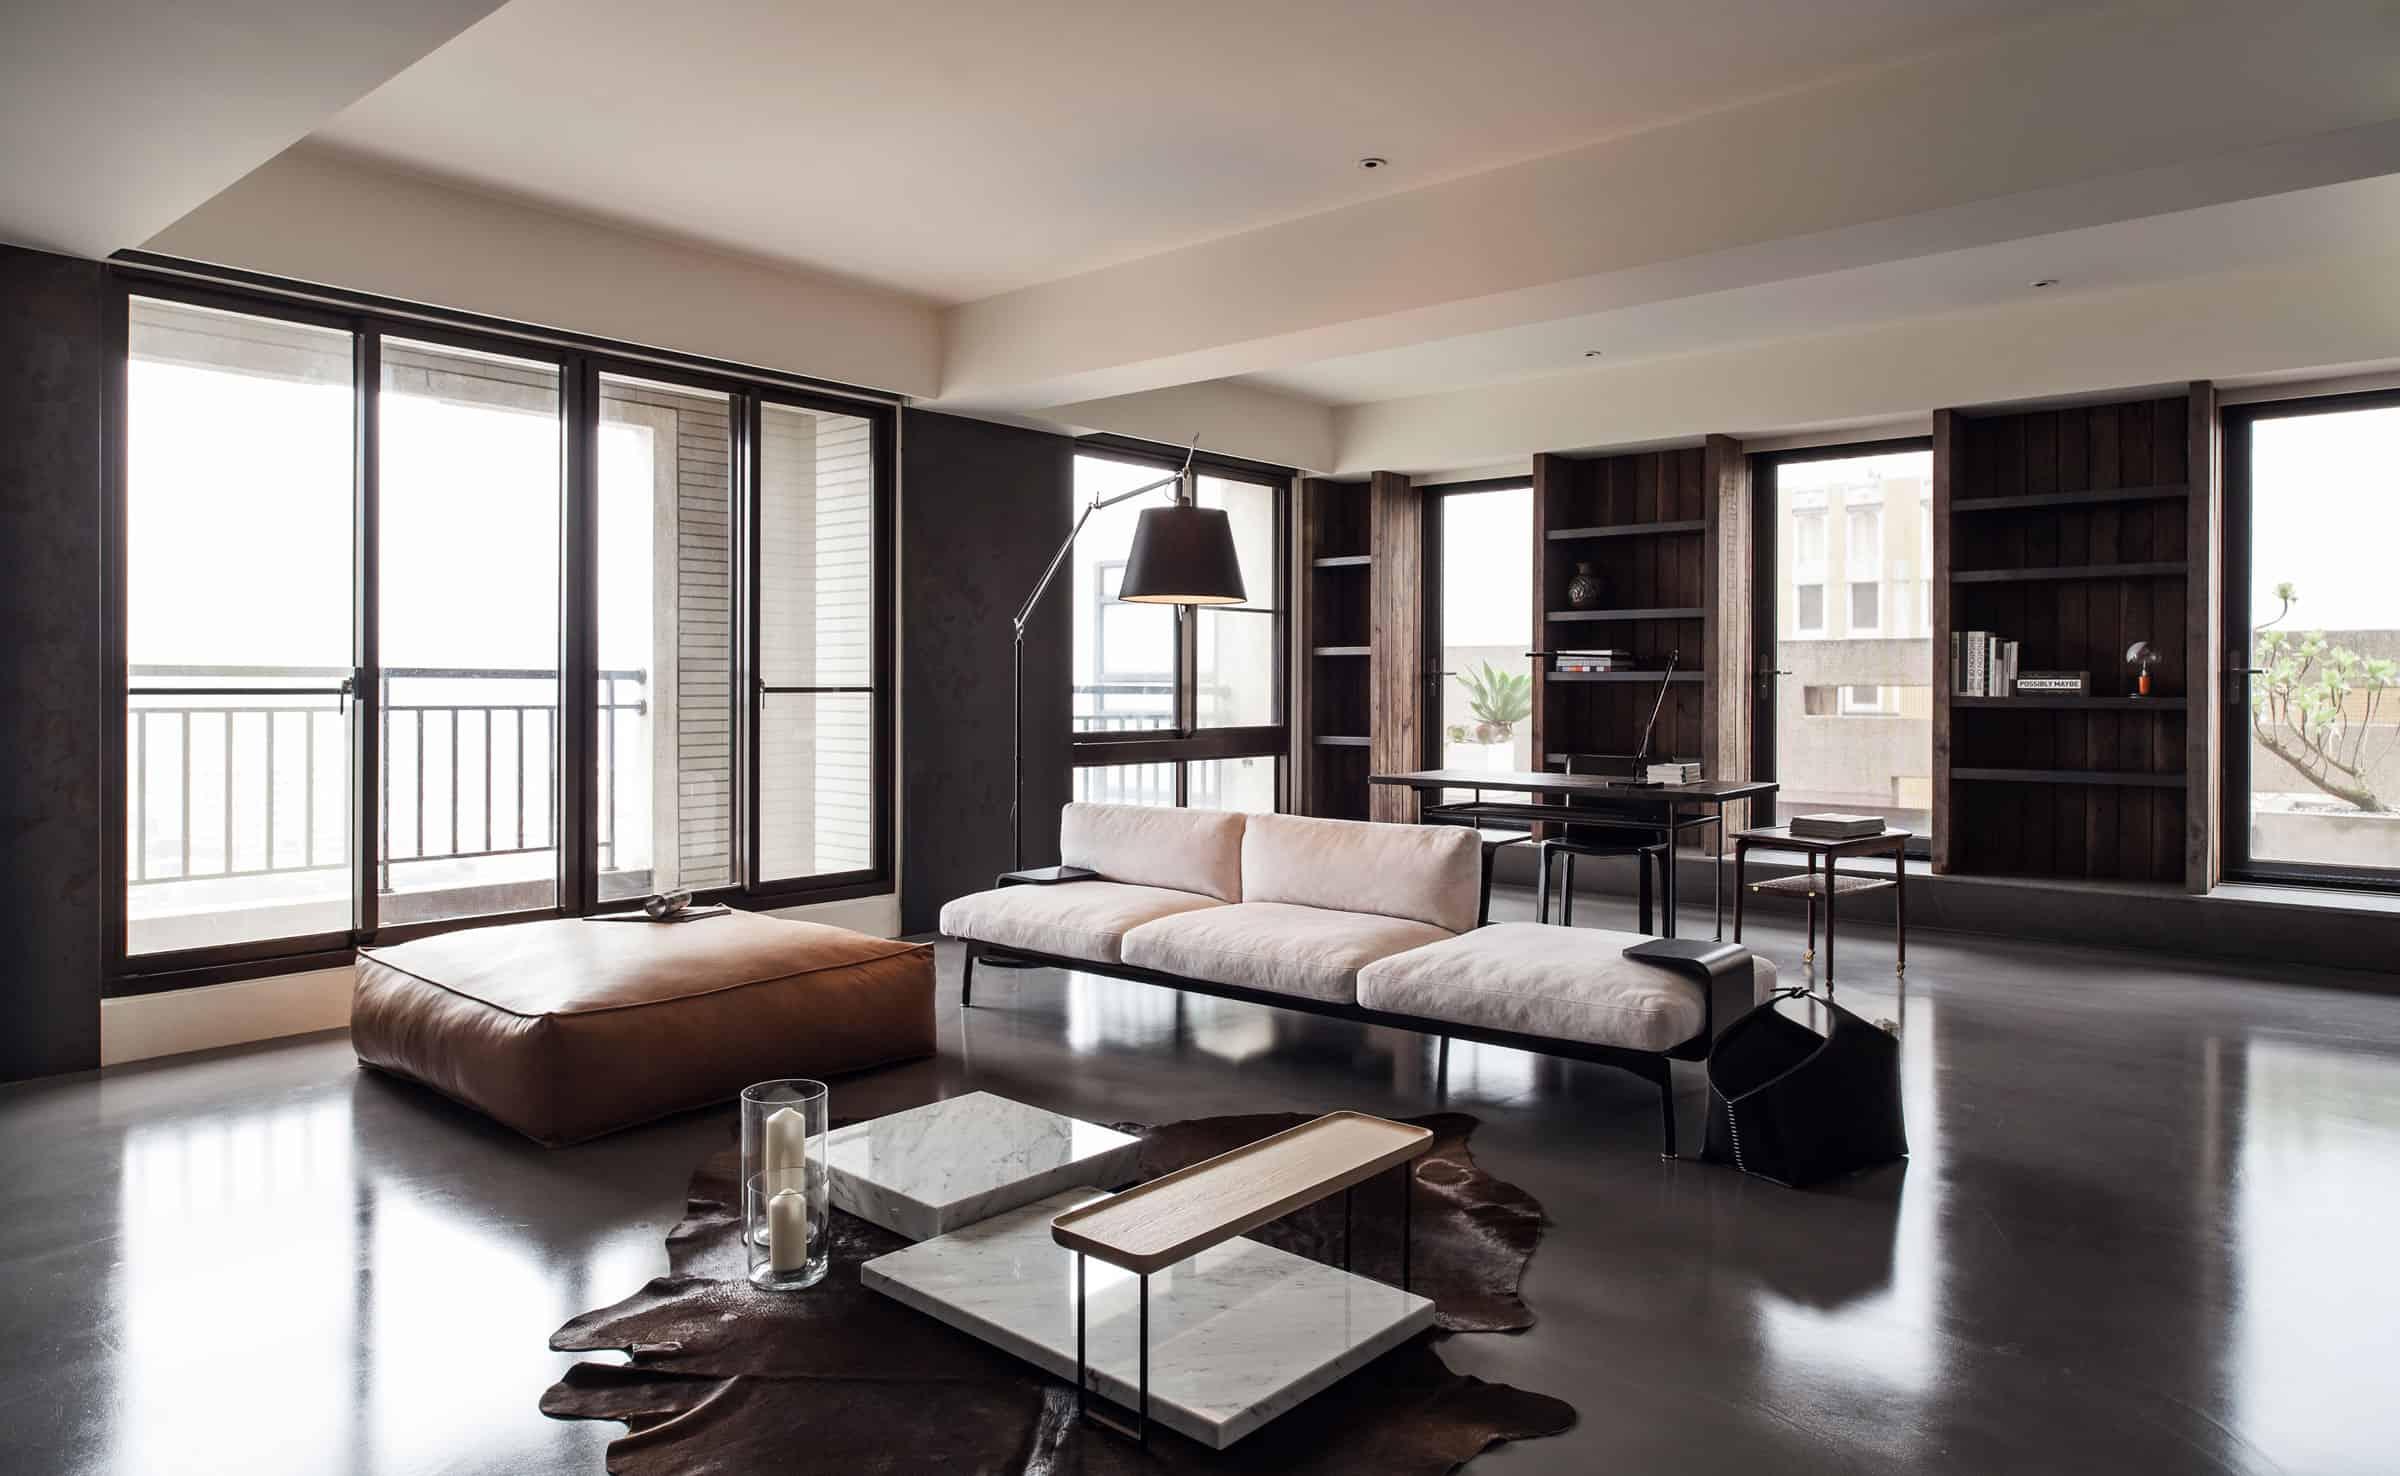 Wei Yi International Design Associates Design an Elegant Concrete Home in Taipei, Taiwan